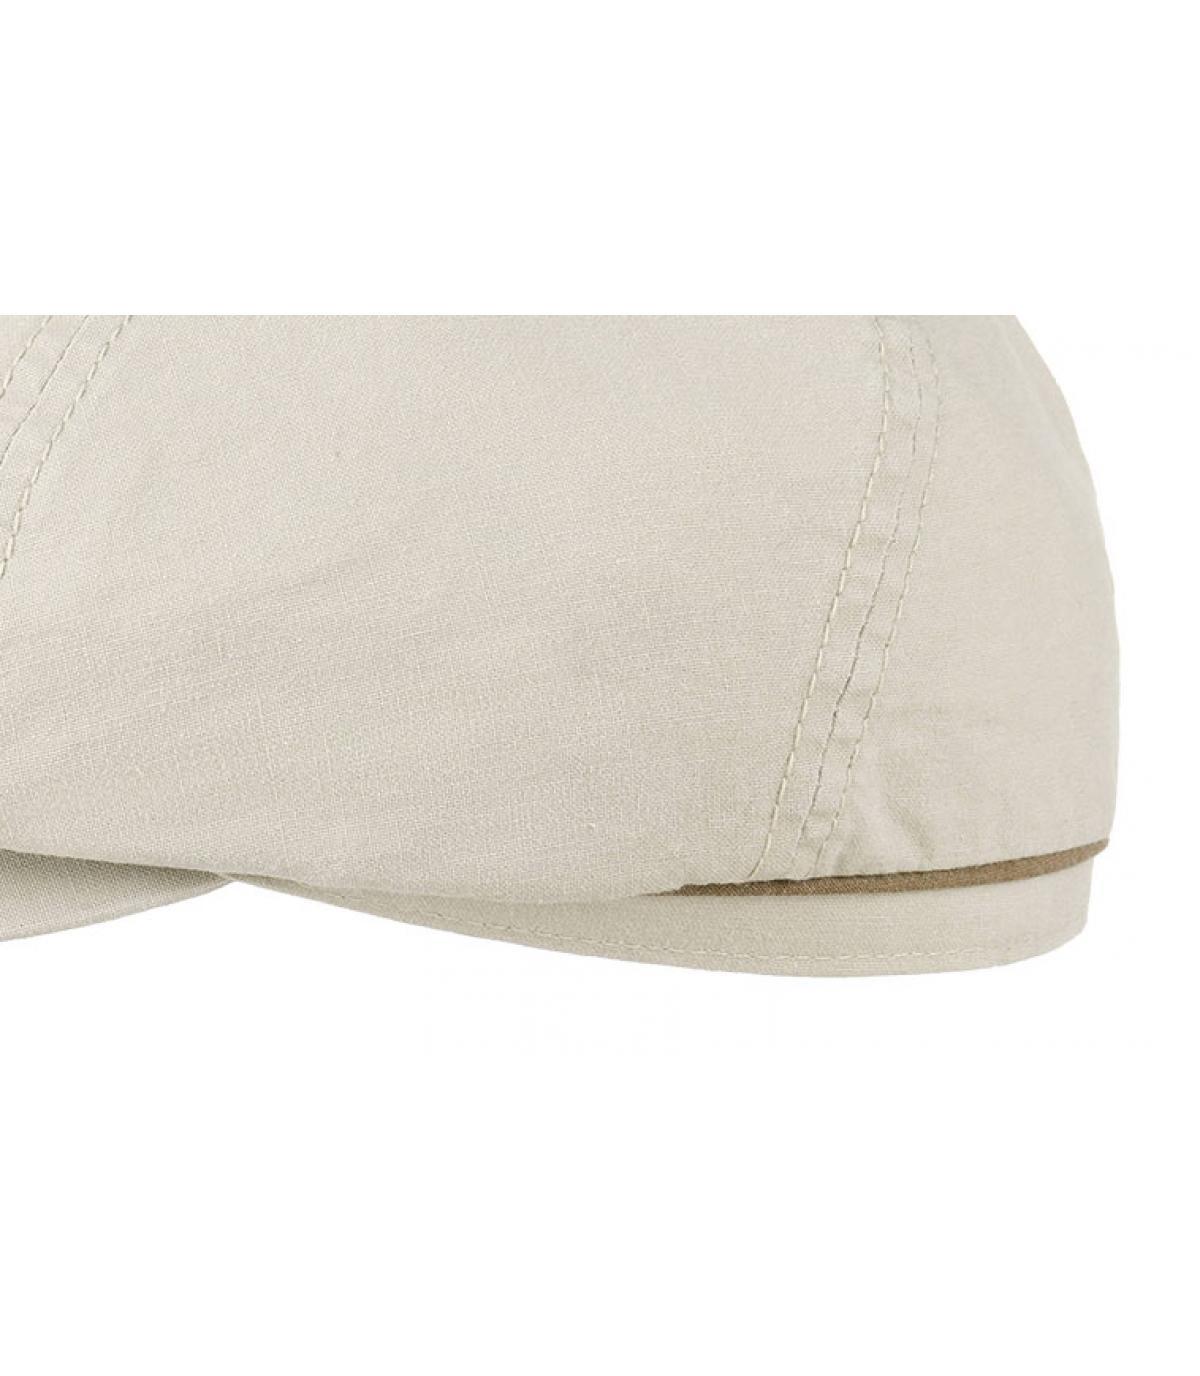 Details Brooklyn cap waxed cotton organic beige - afbeeling 3